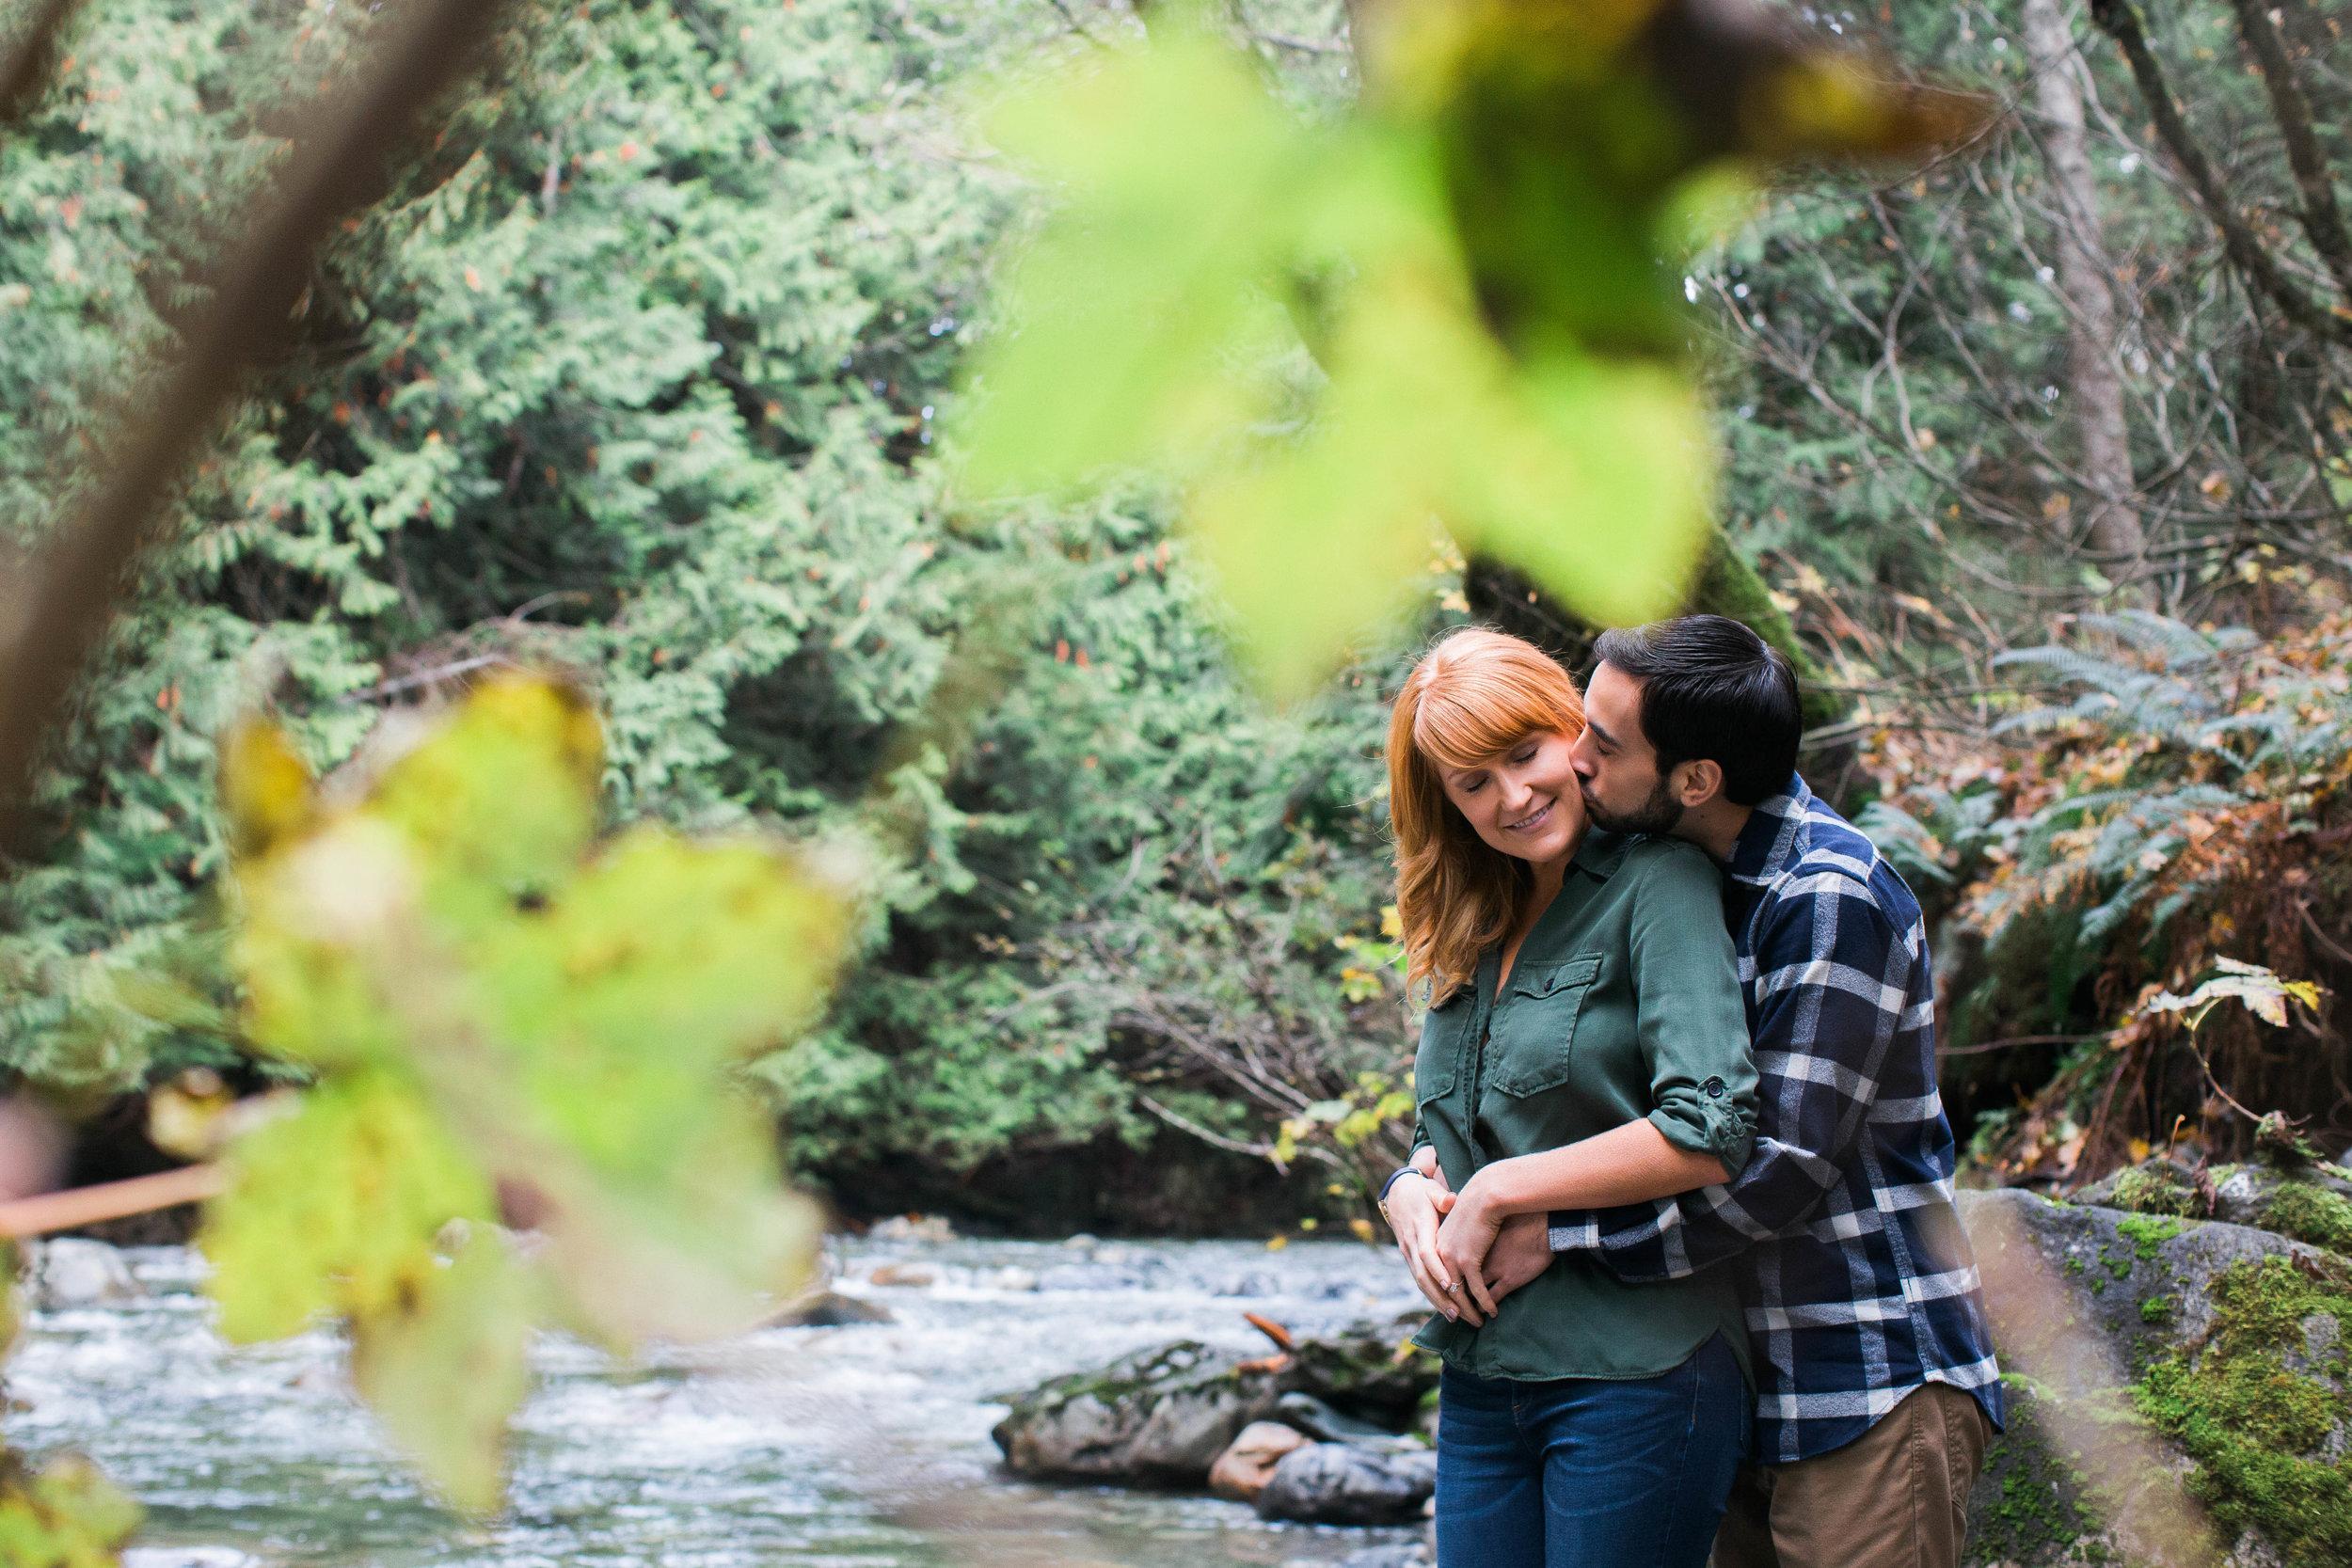 Ryan+Nicole_Franklin+Falls+Engagement_APW2016_1.JPG